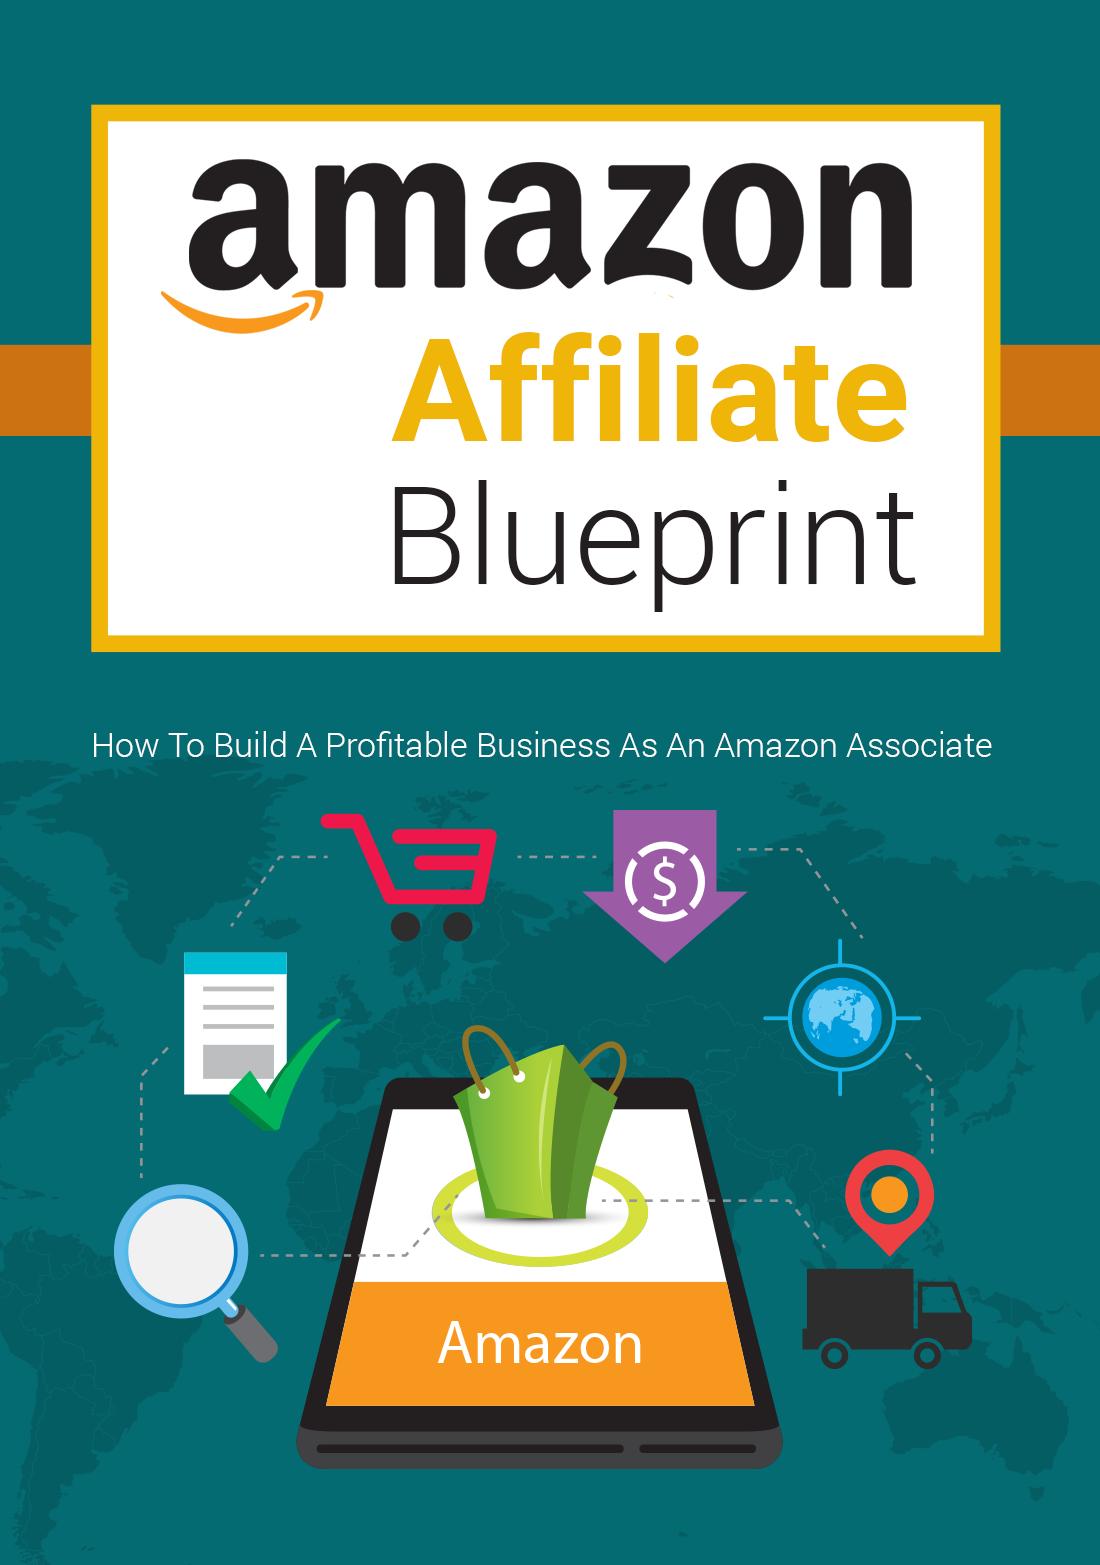 Amazon Affiliate Blueprint How To Build A Profitable